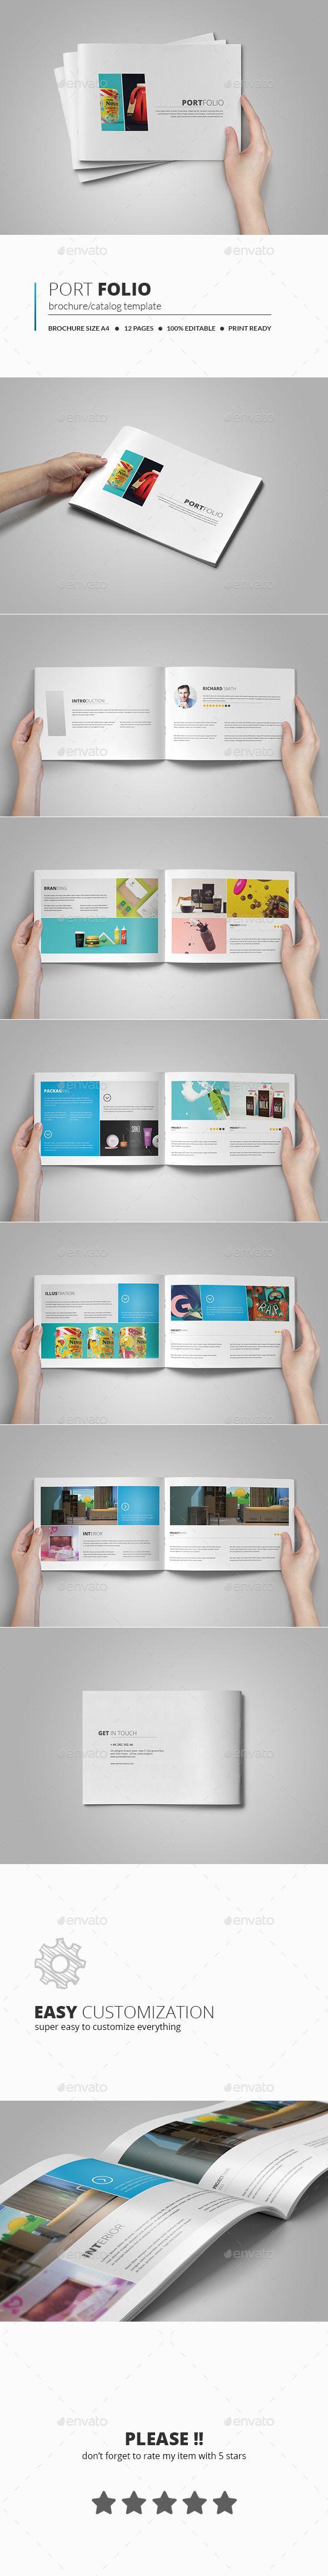 Portfolio Brochure Template. Download: http://graphicriver.net/item/portfolio-brochure-template/10985261?ref=ksioks